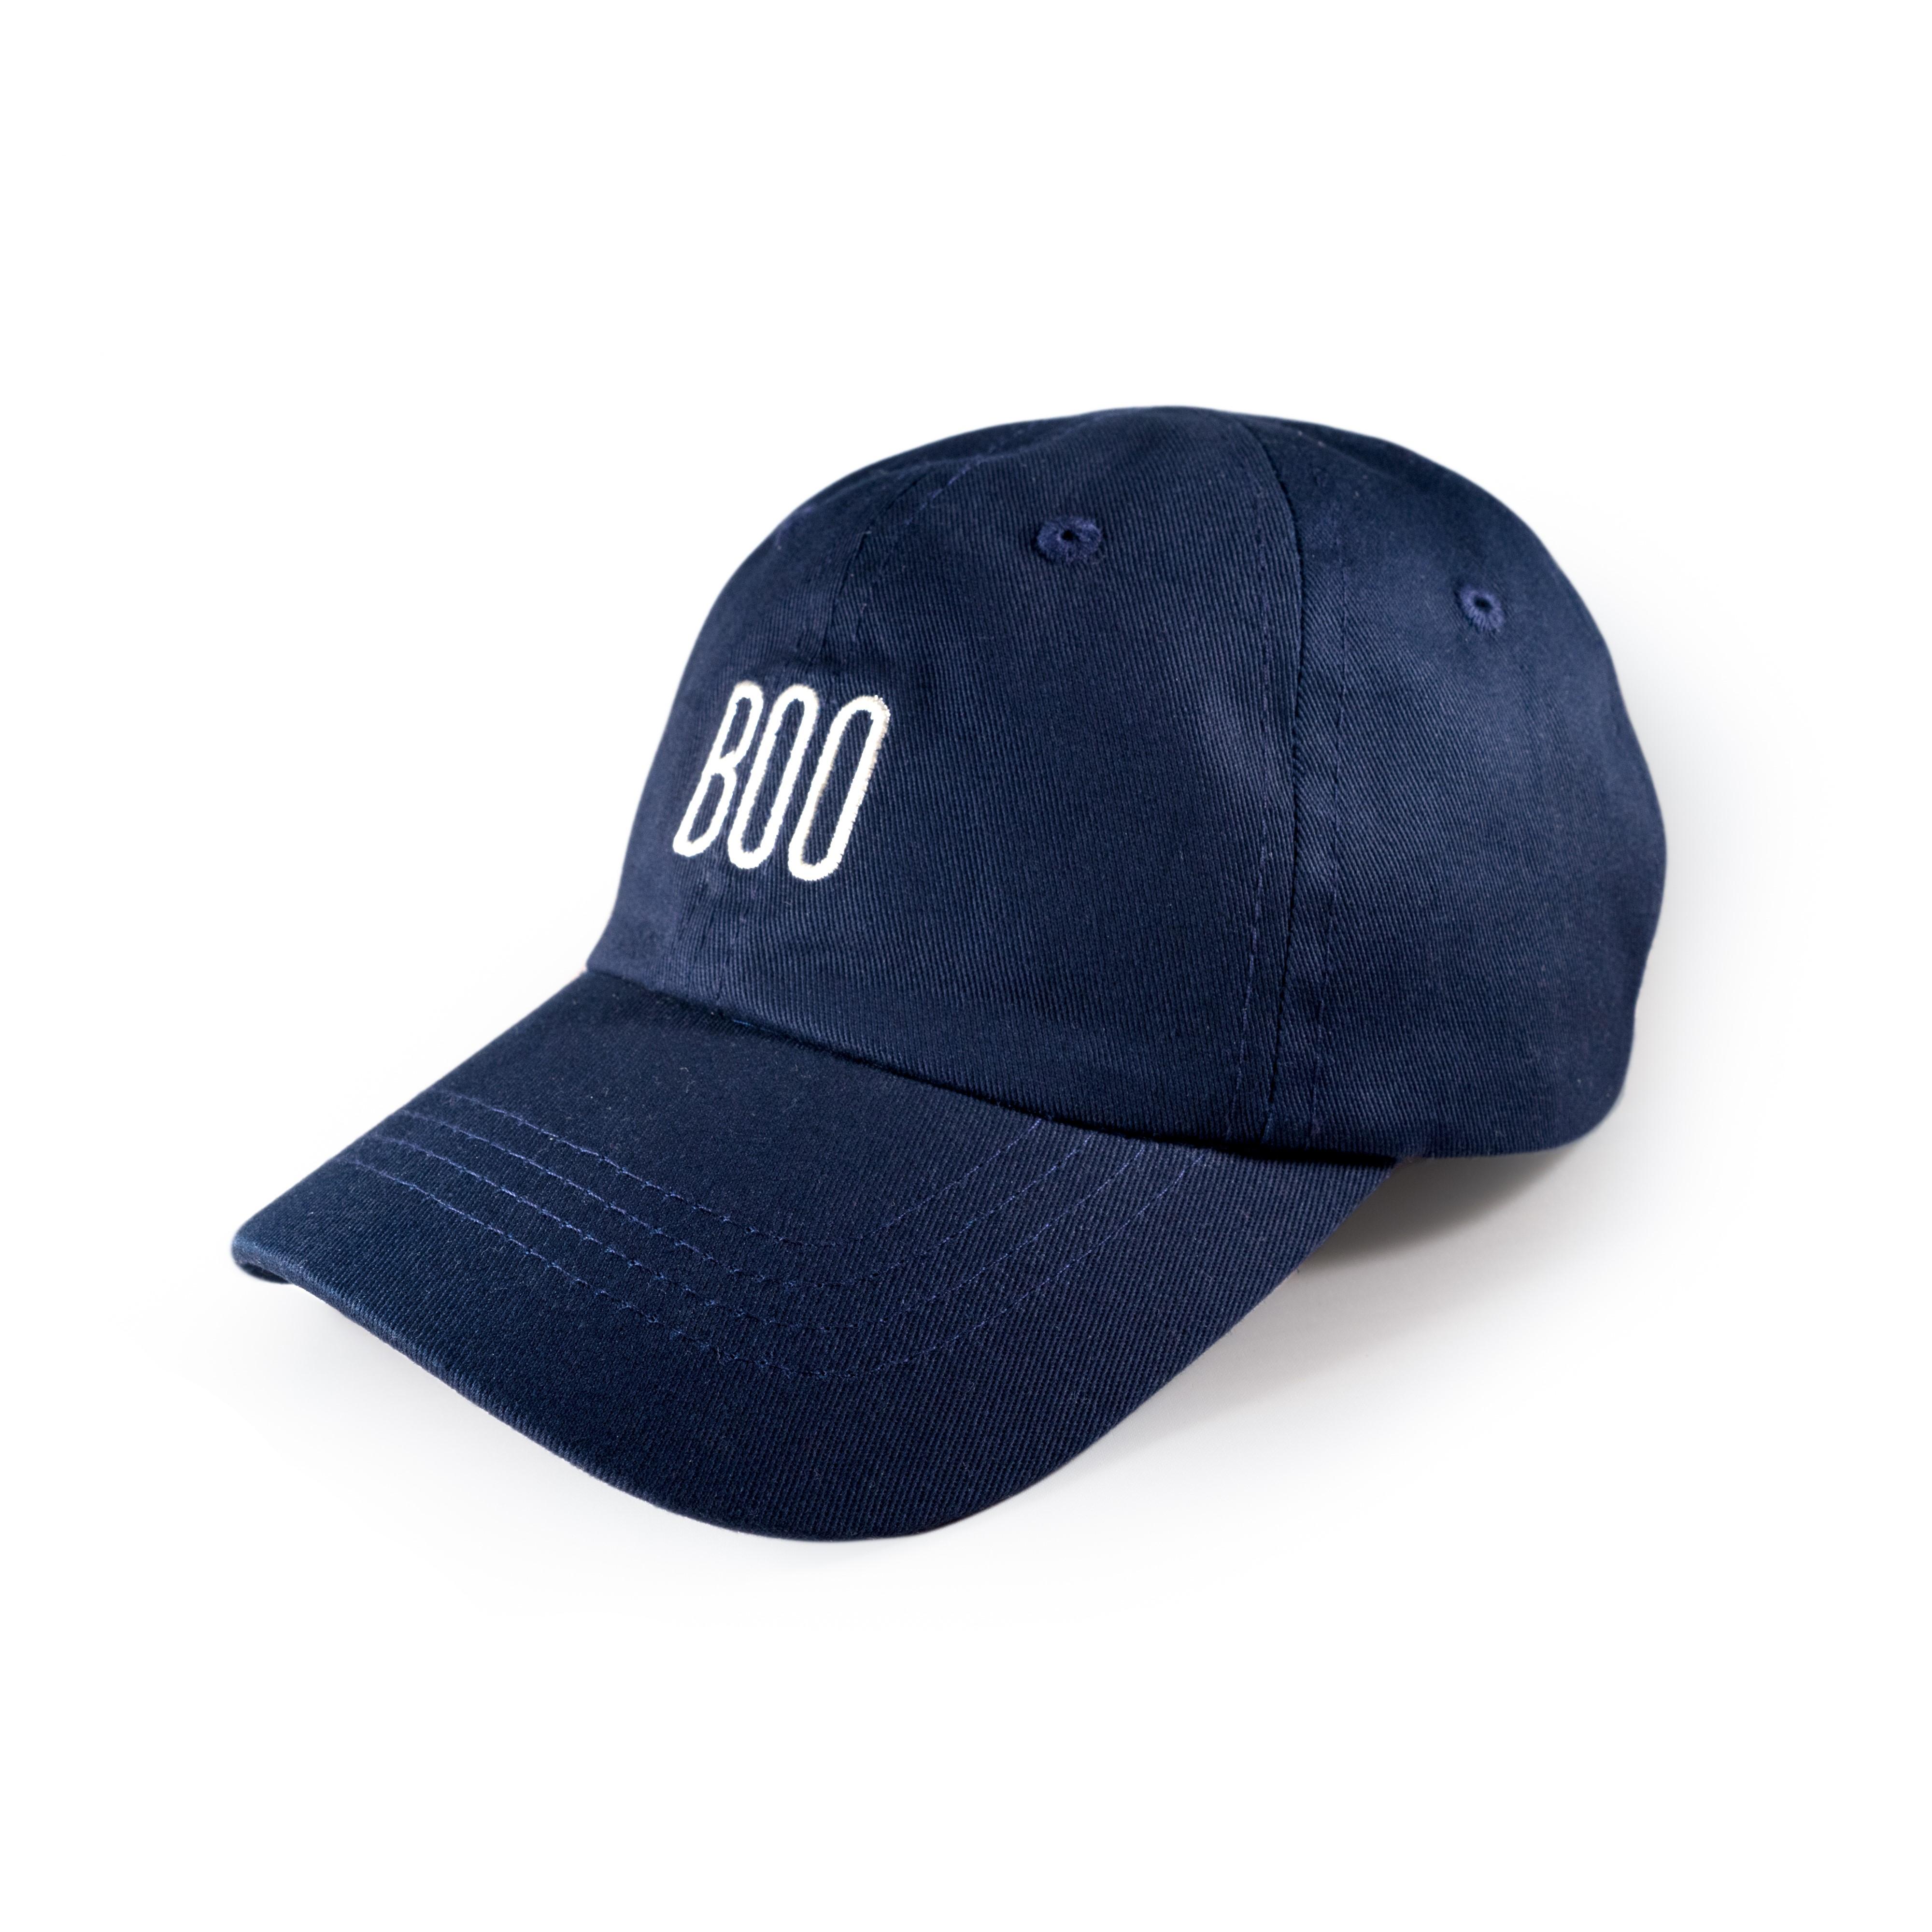 LIL'BOO   BOO BASEBALL CAP, NAVY